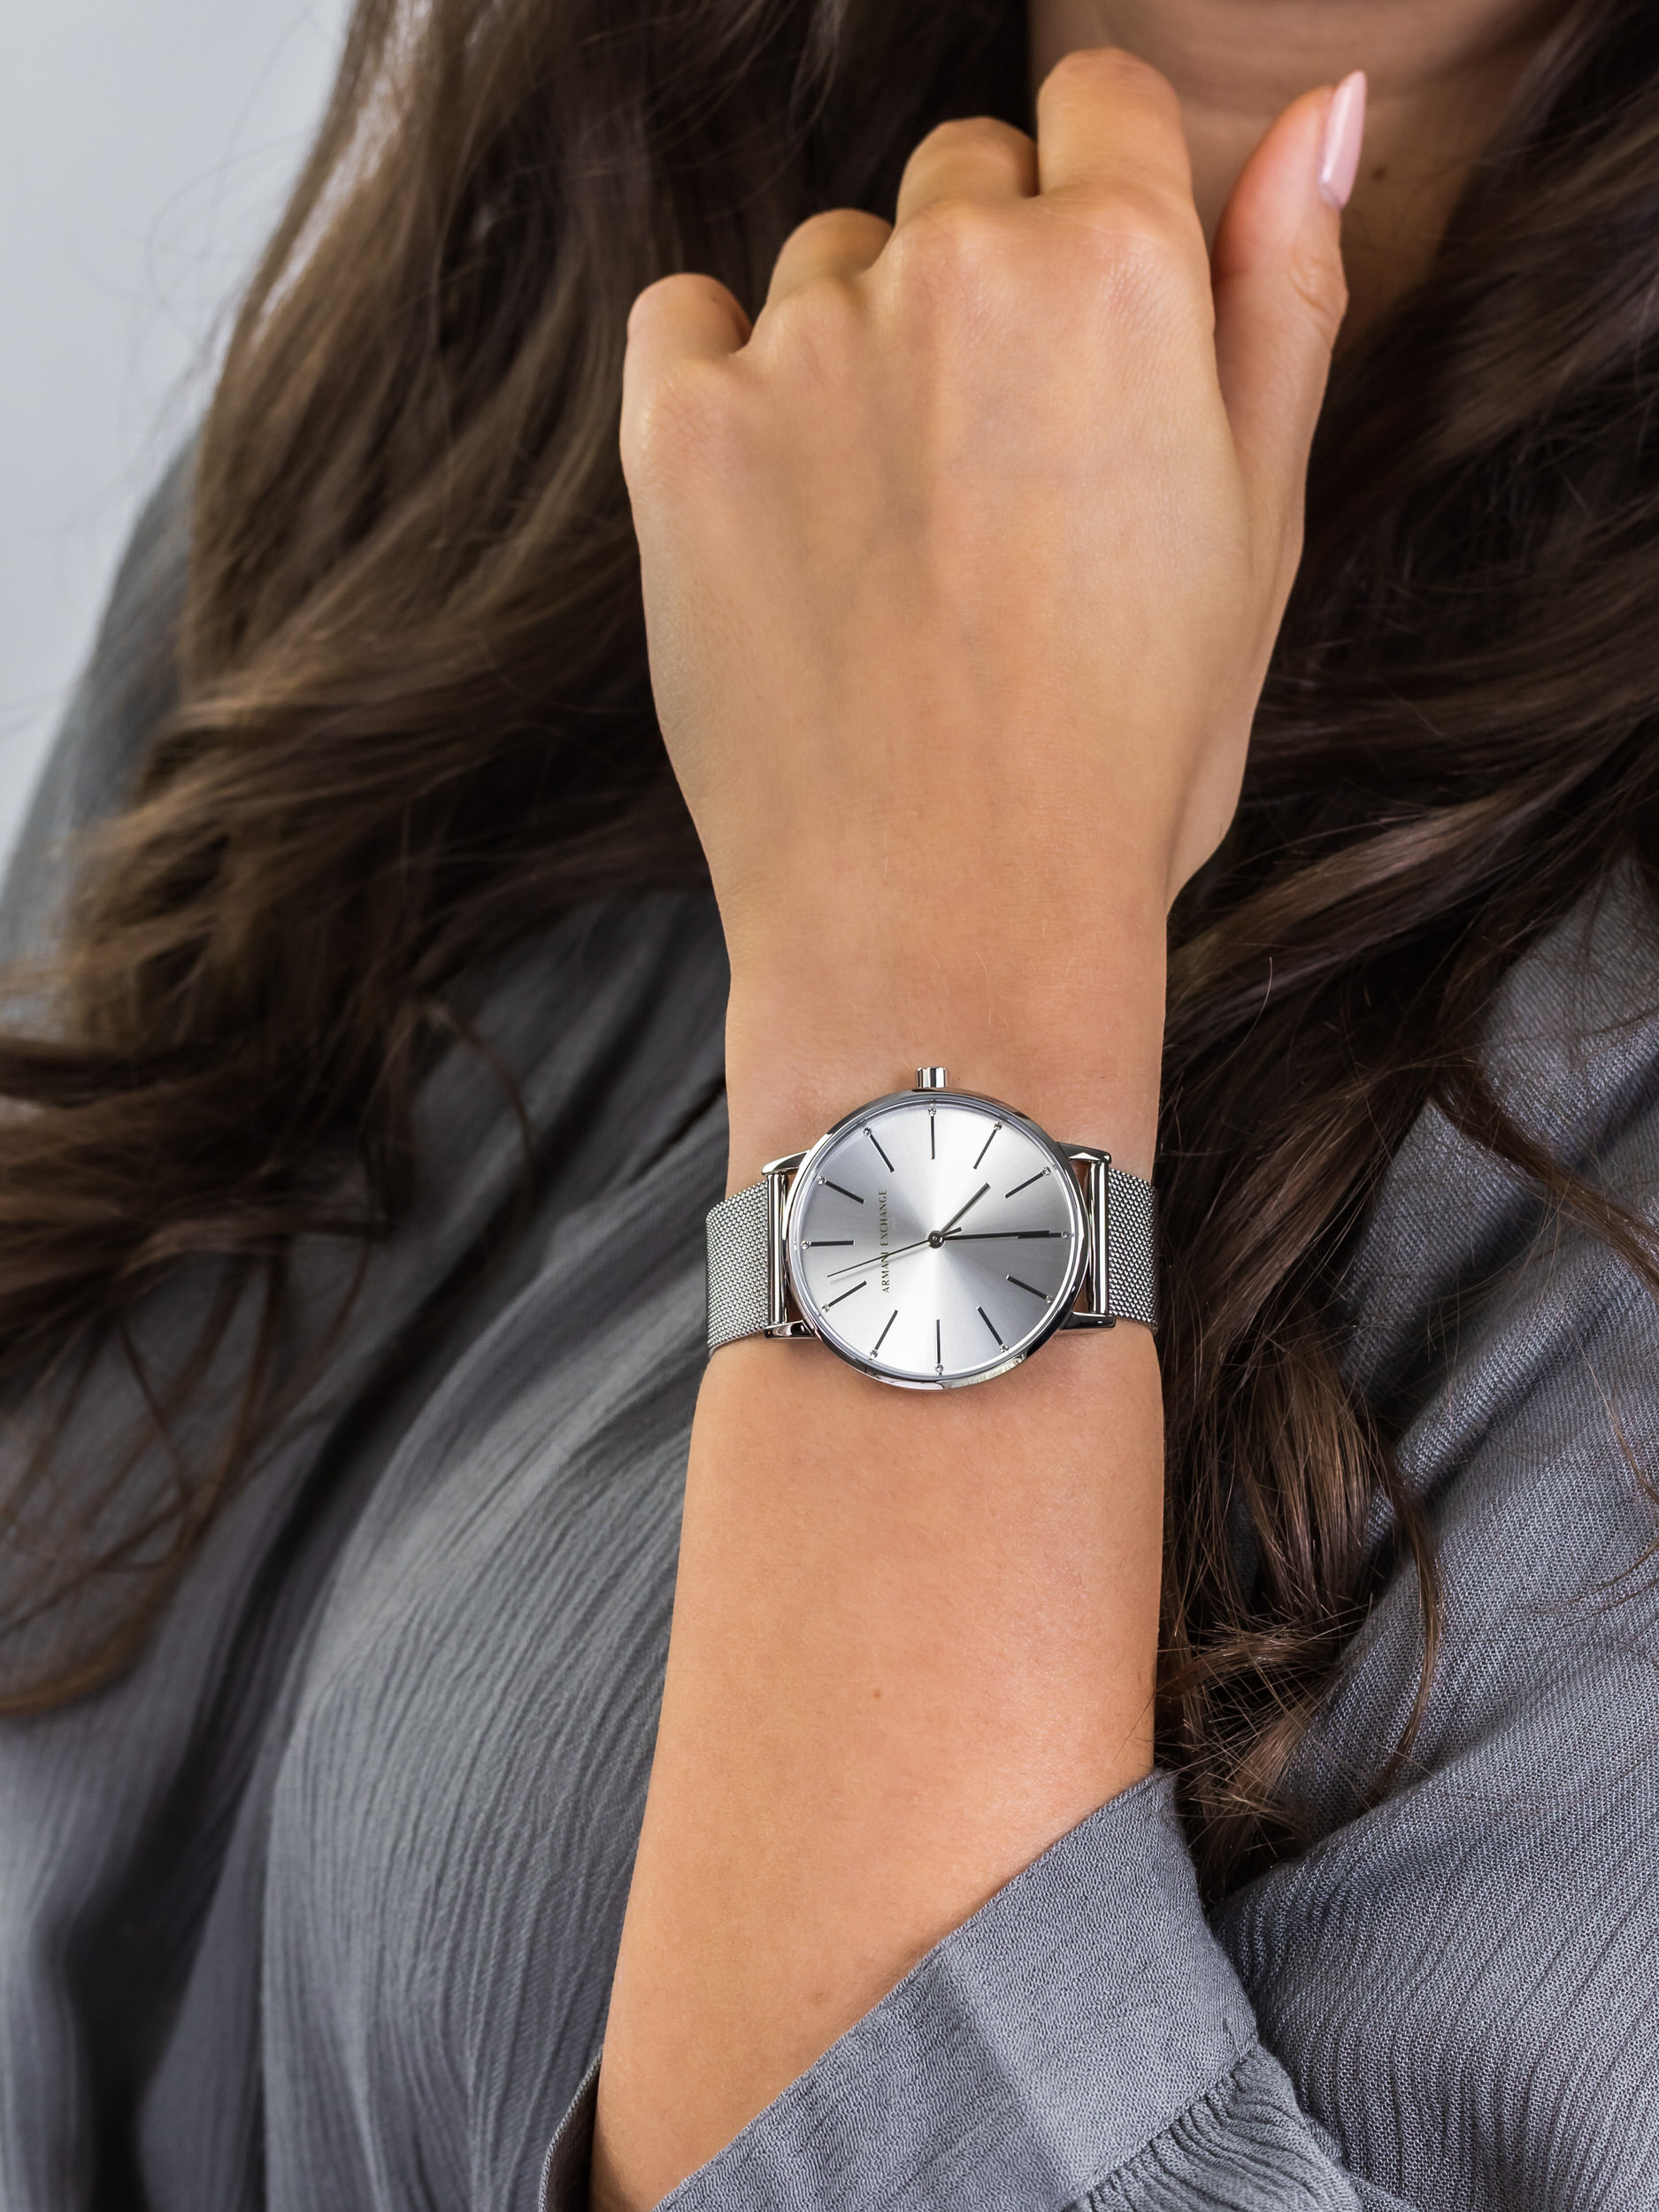 Armani Exchange AX5535 damski zegarek Fashion bransoleta